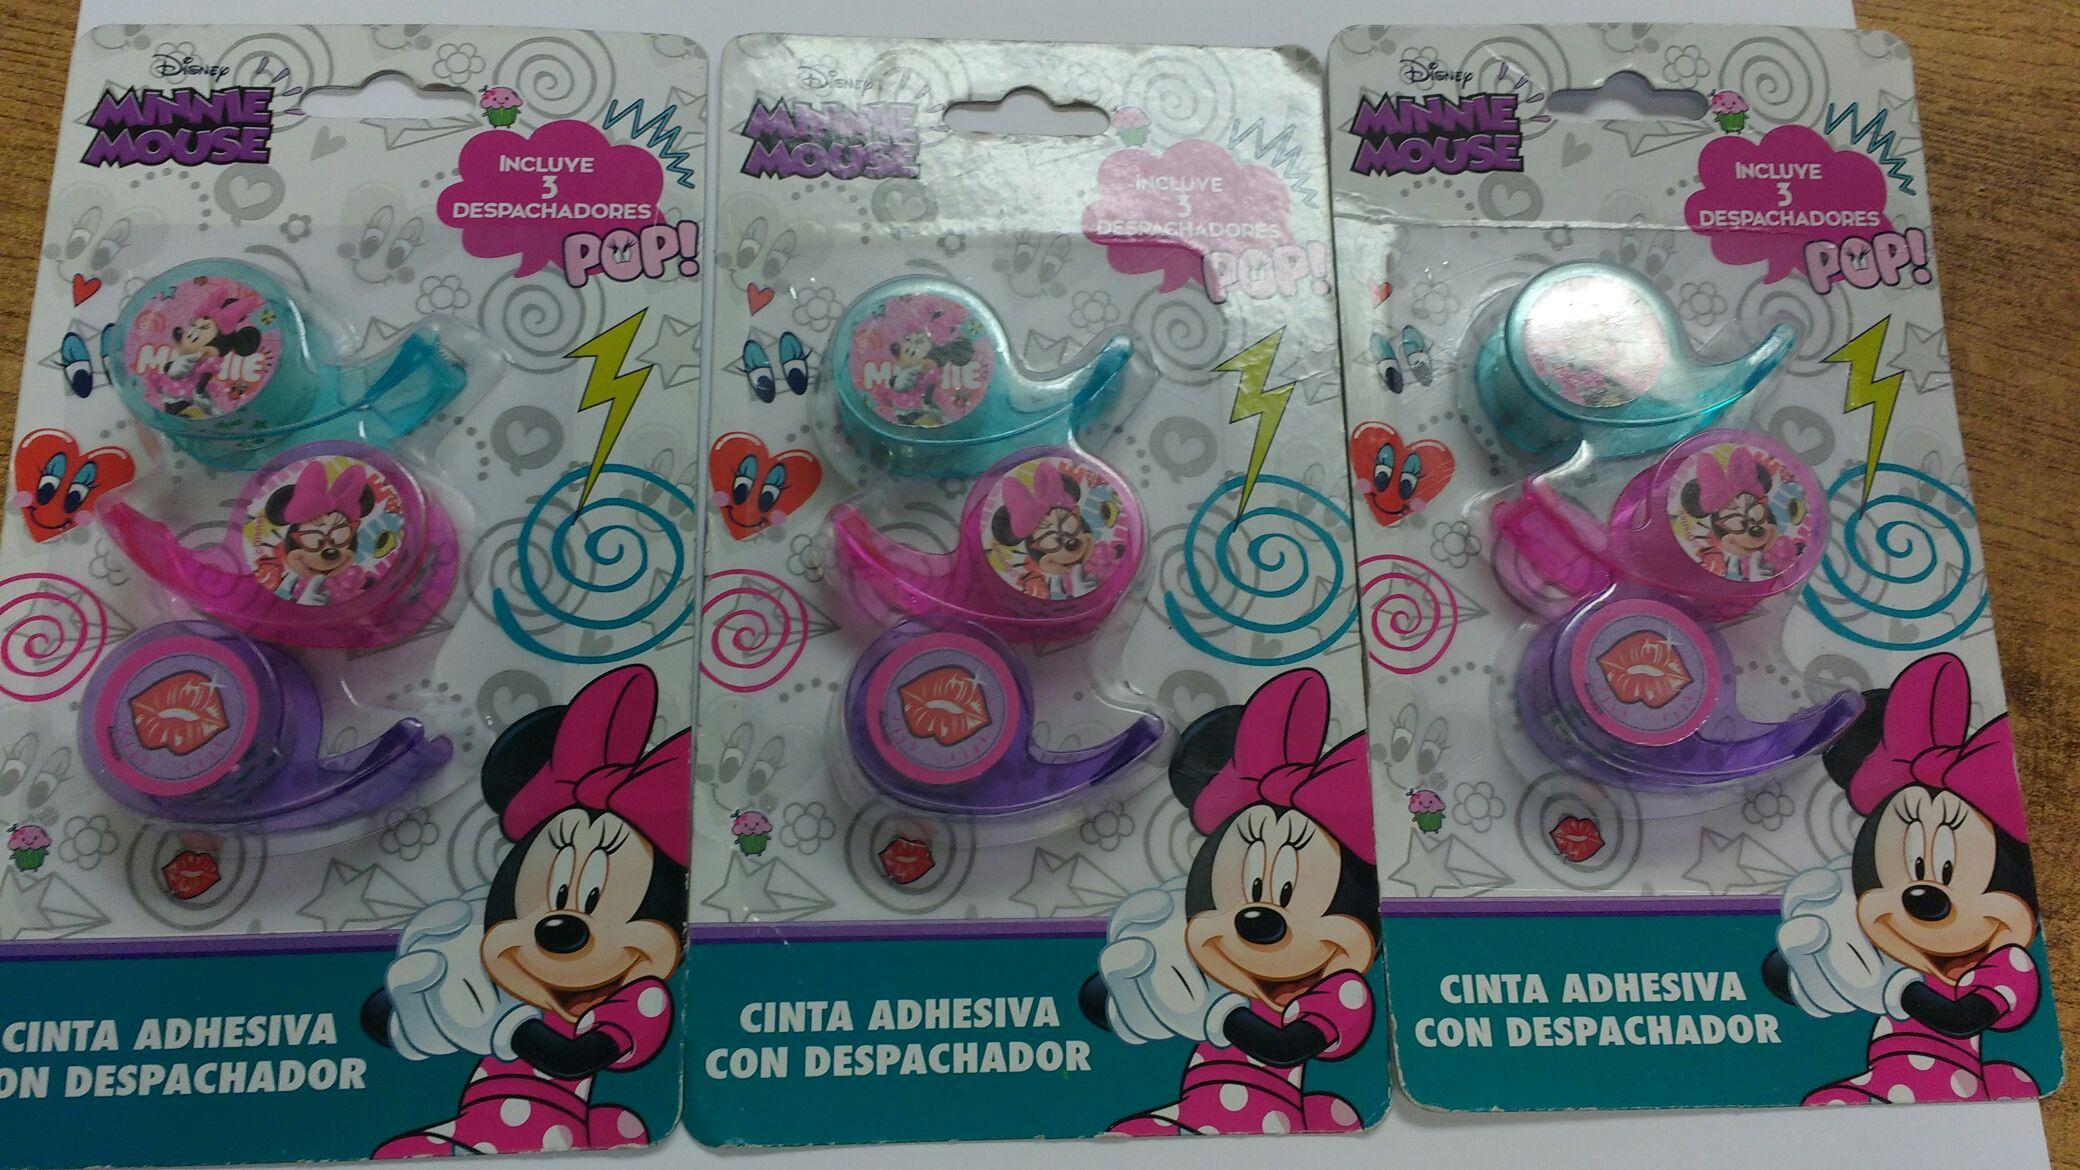 Walmart Plaza las Américas: Cinta adhesiva con despachador de Minnie Mouse a $0.01